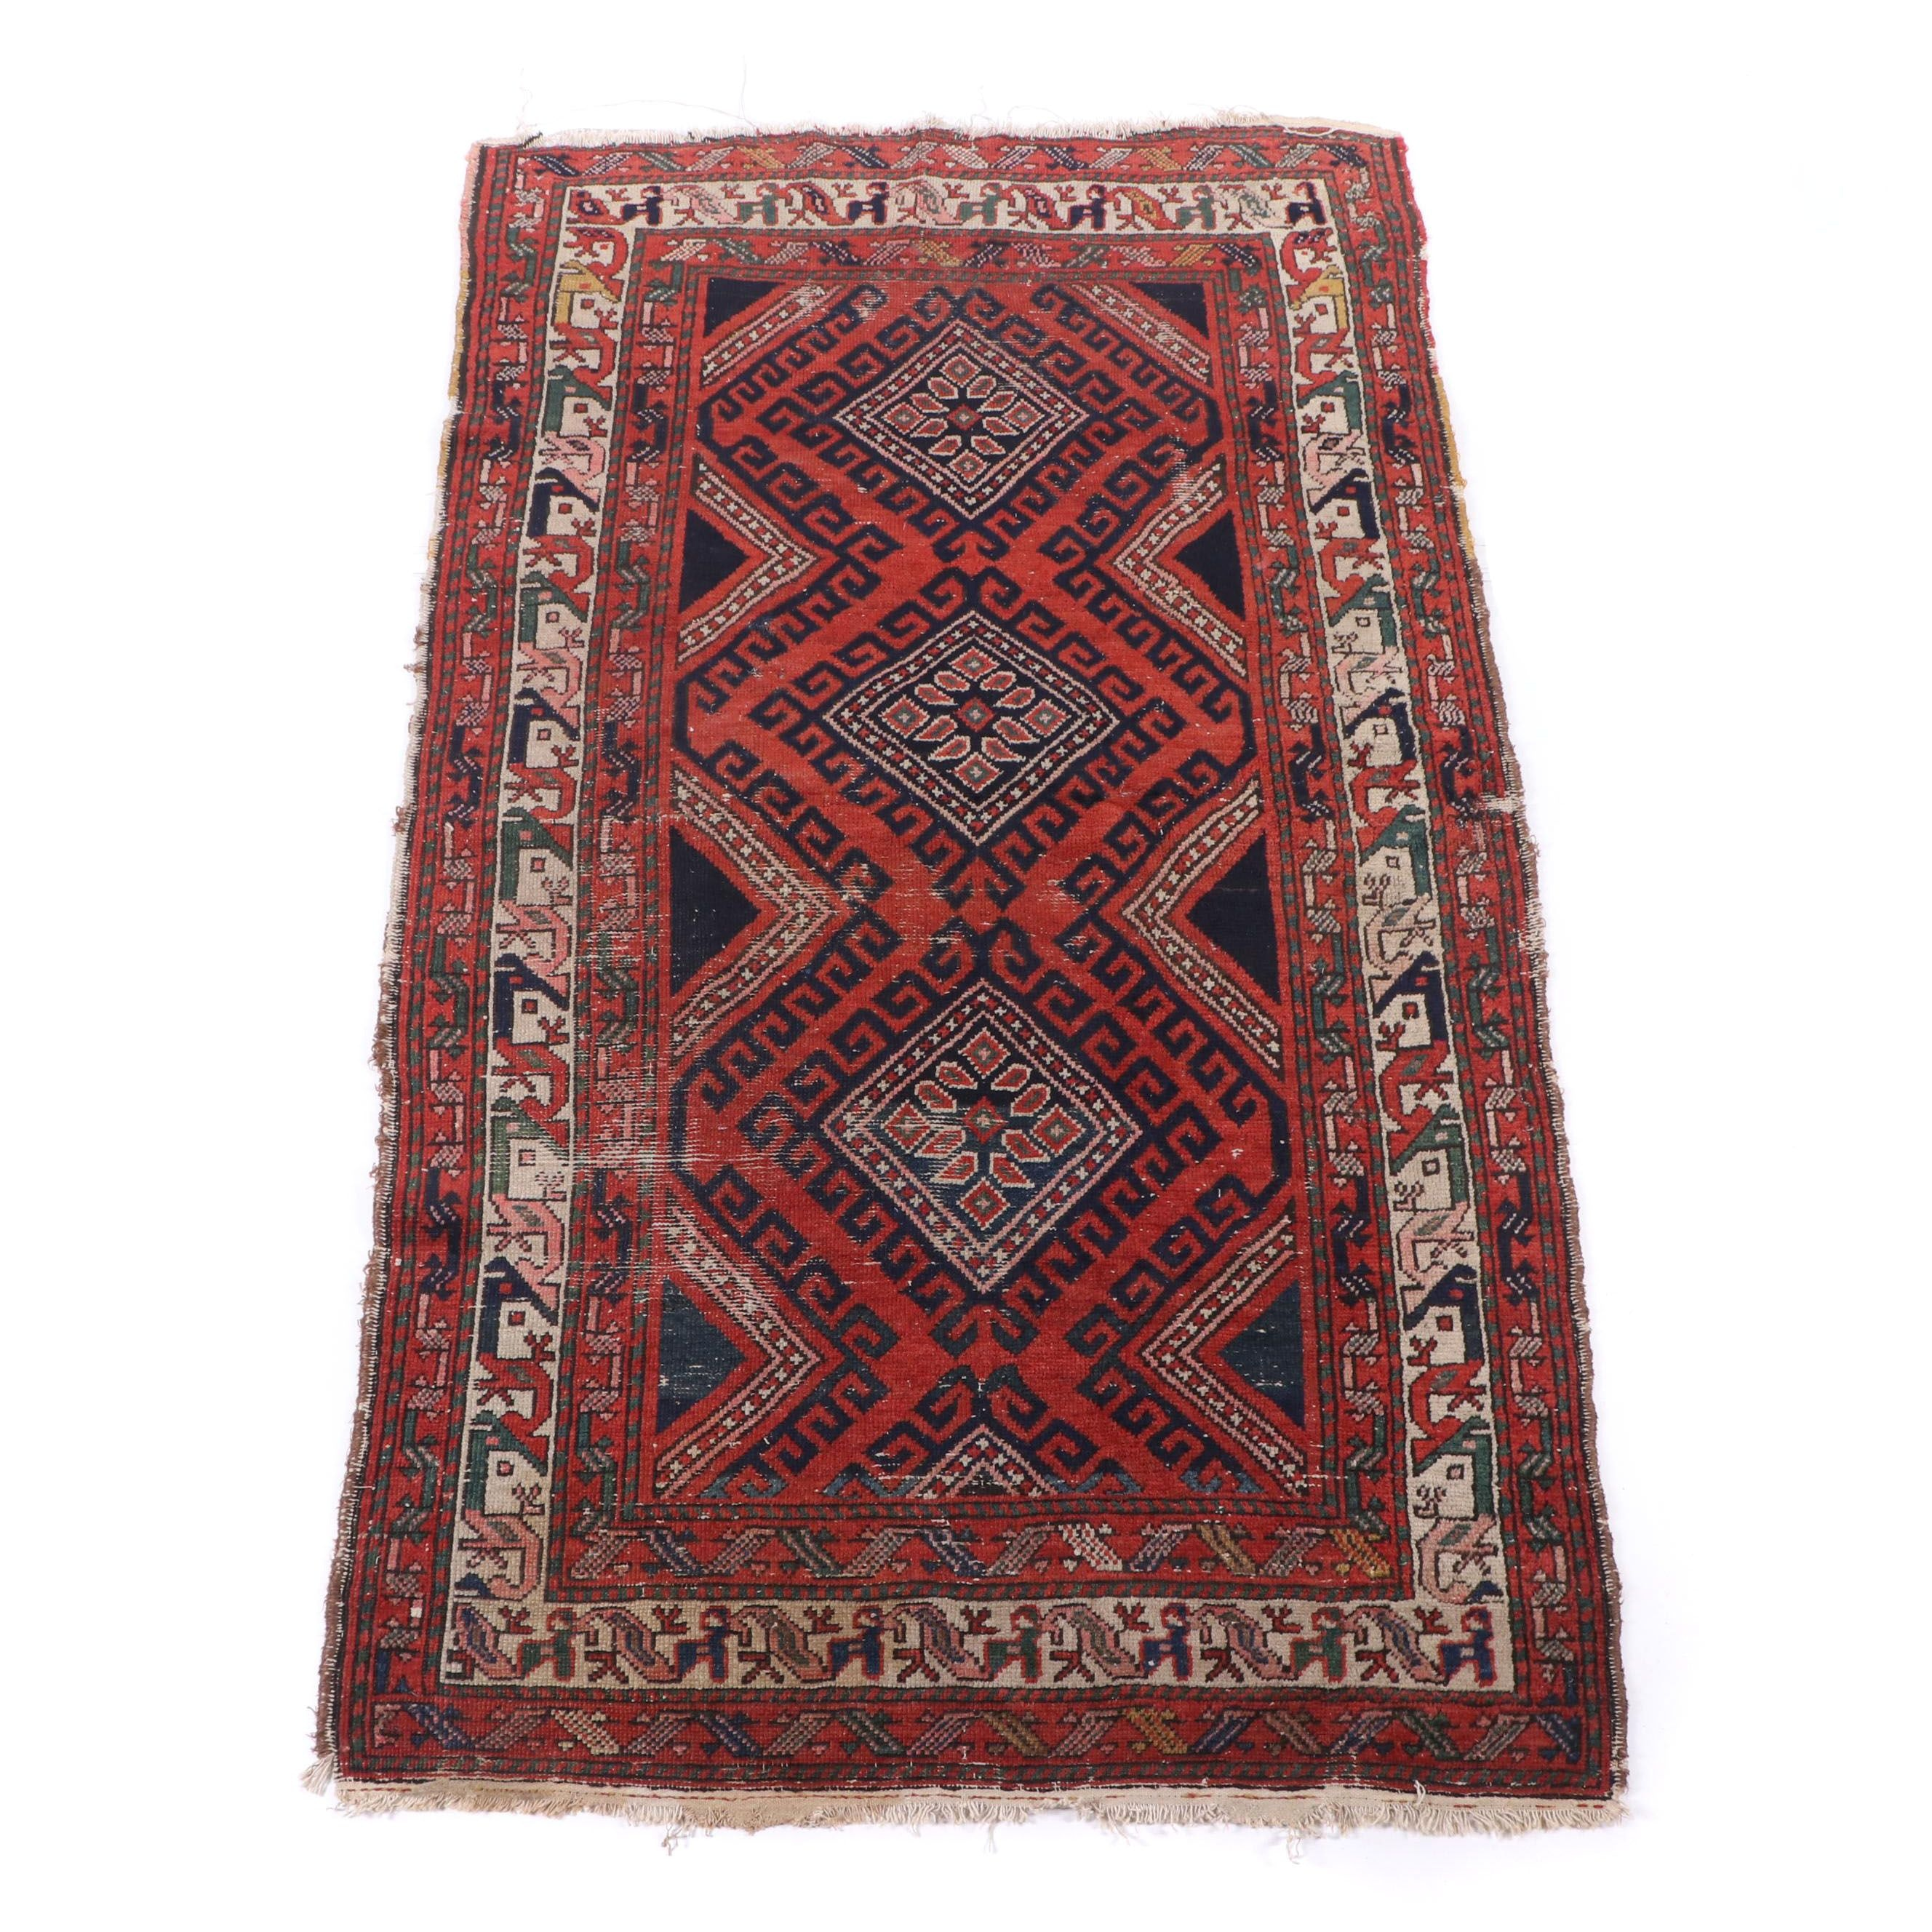 Hand-Knotted Kurdish Kolyai Wool Rug